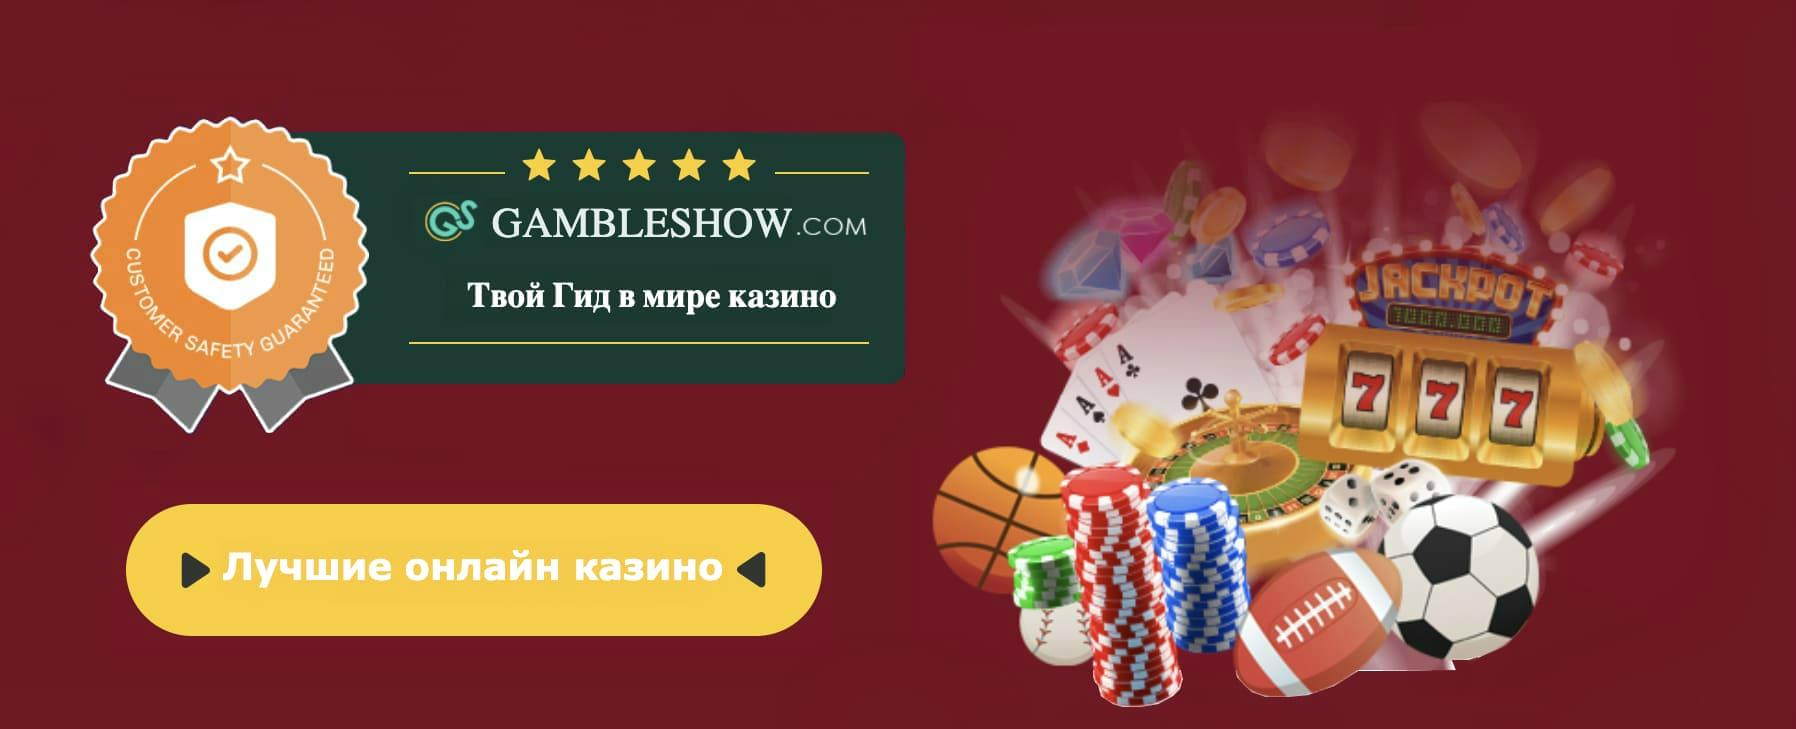 Онлайн казино tp htubcnhfwbb